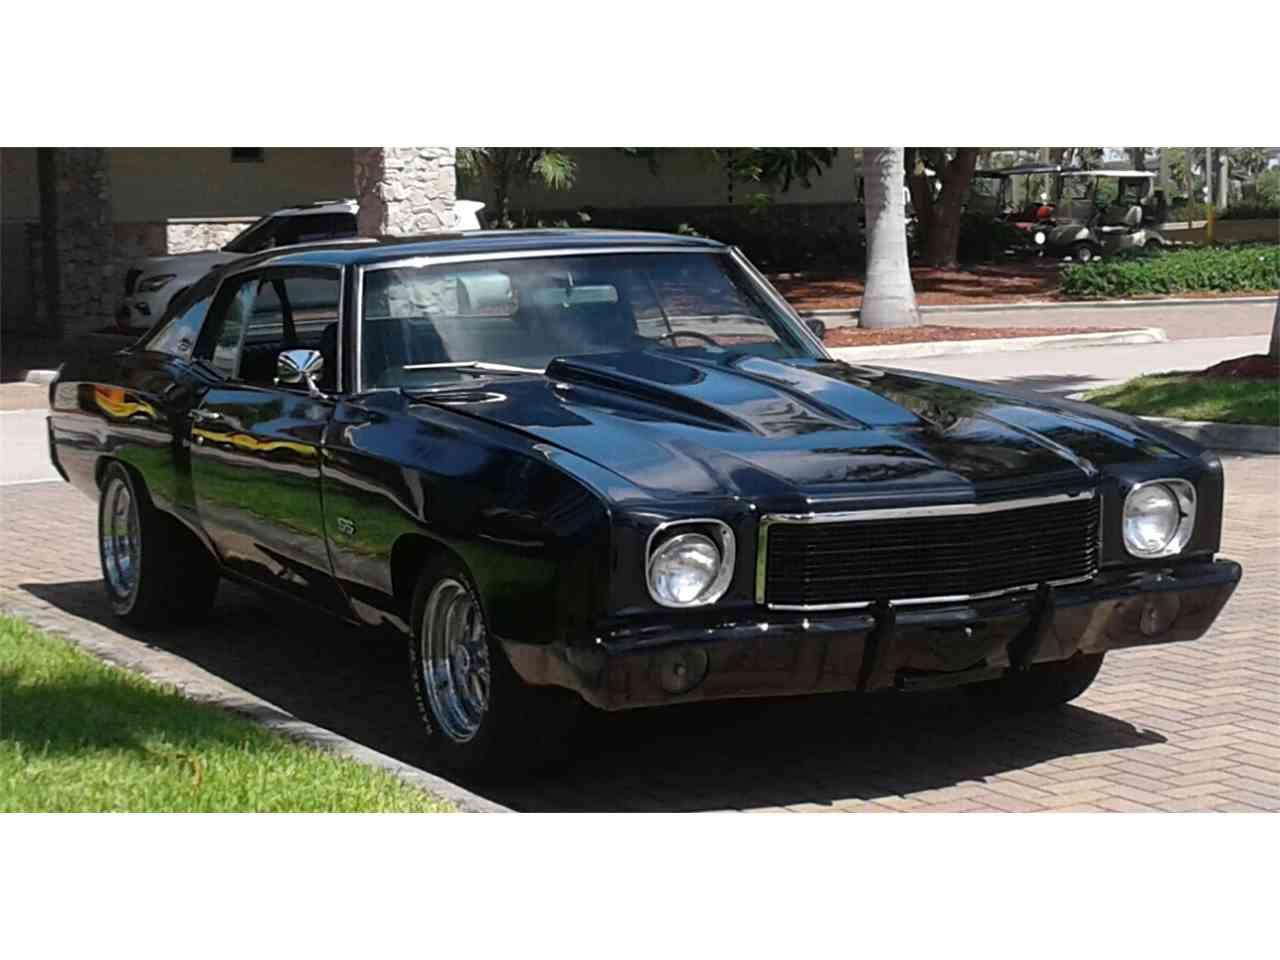 87 Monte Carlo Ss Black >> 1970 Chevrolet Monte Carlo SS for Sale | ClassicCars.com | CC-875478